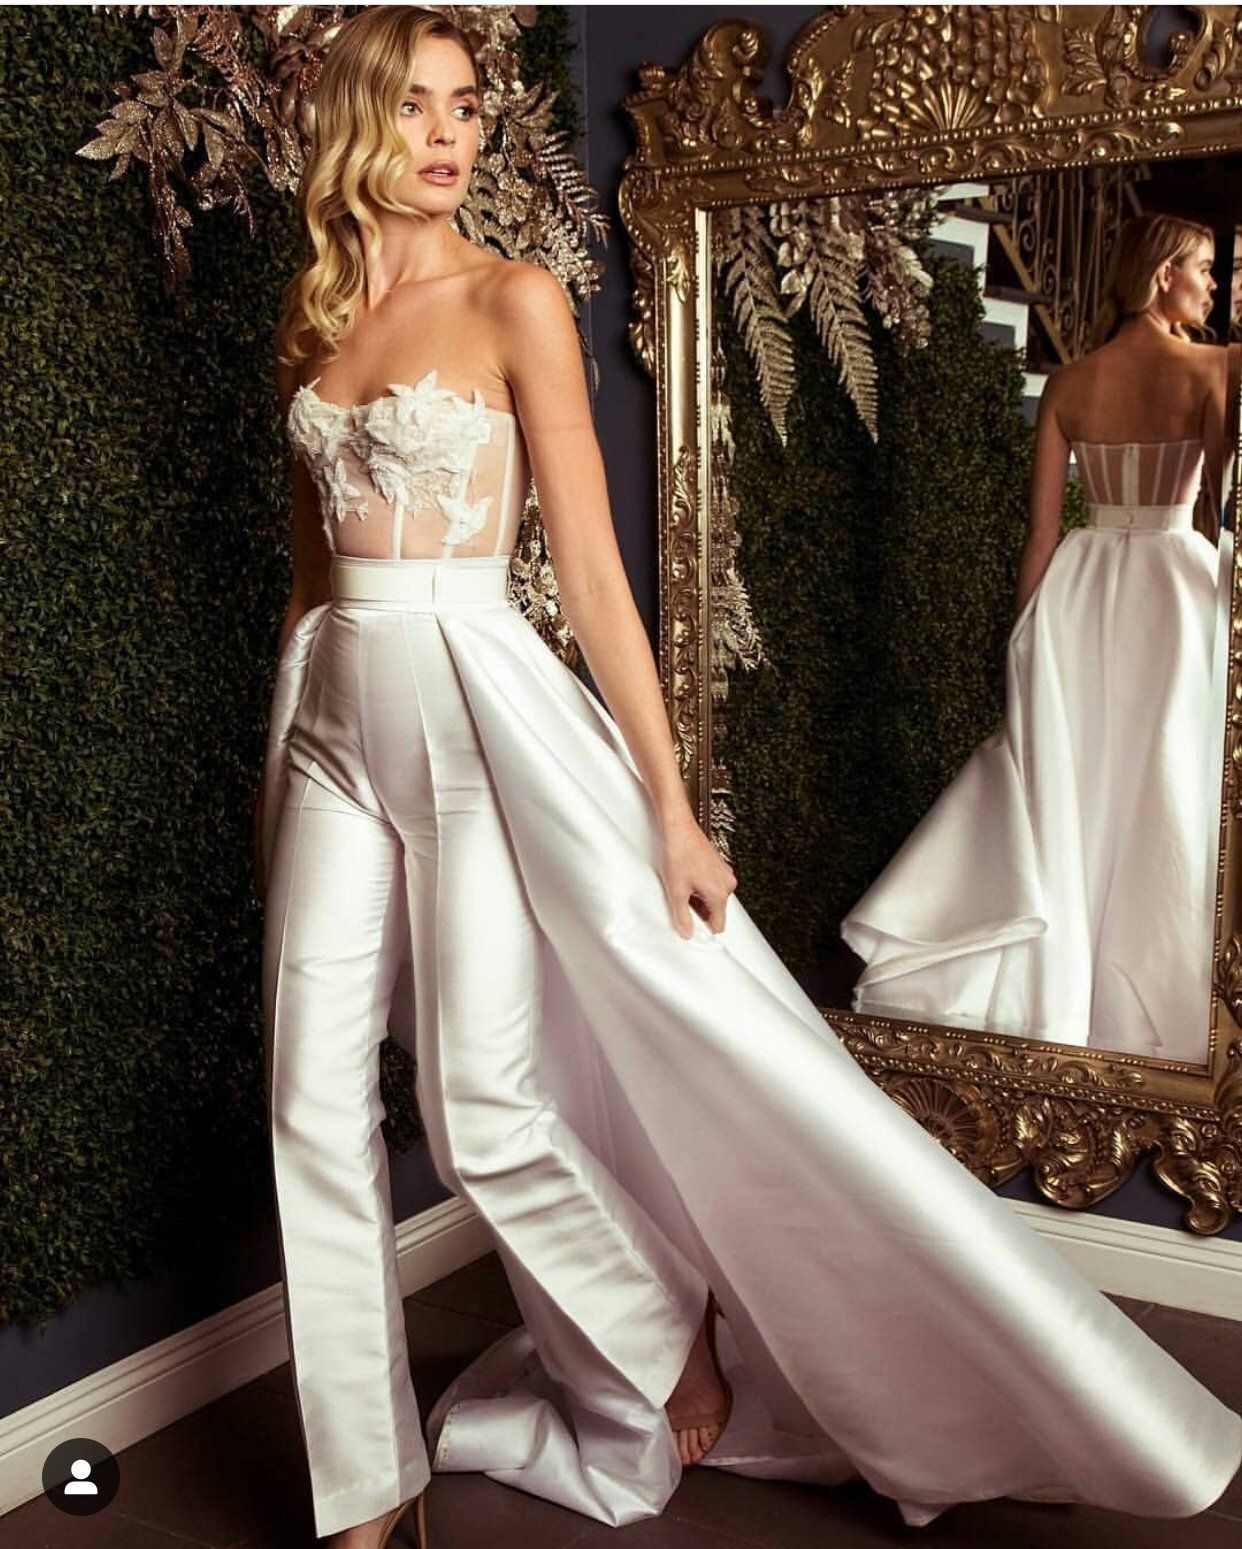 b3ef07543c7  rompersforwomen  jumpsuits  pants  weddingdress  mermaideveningdress   eveningdresses  formalpartydress